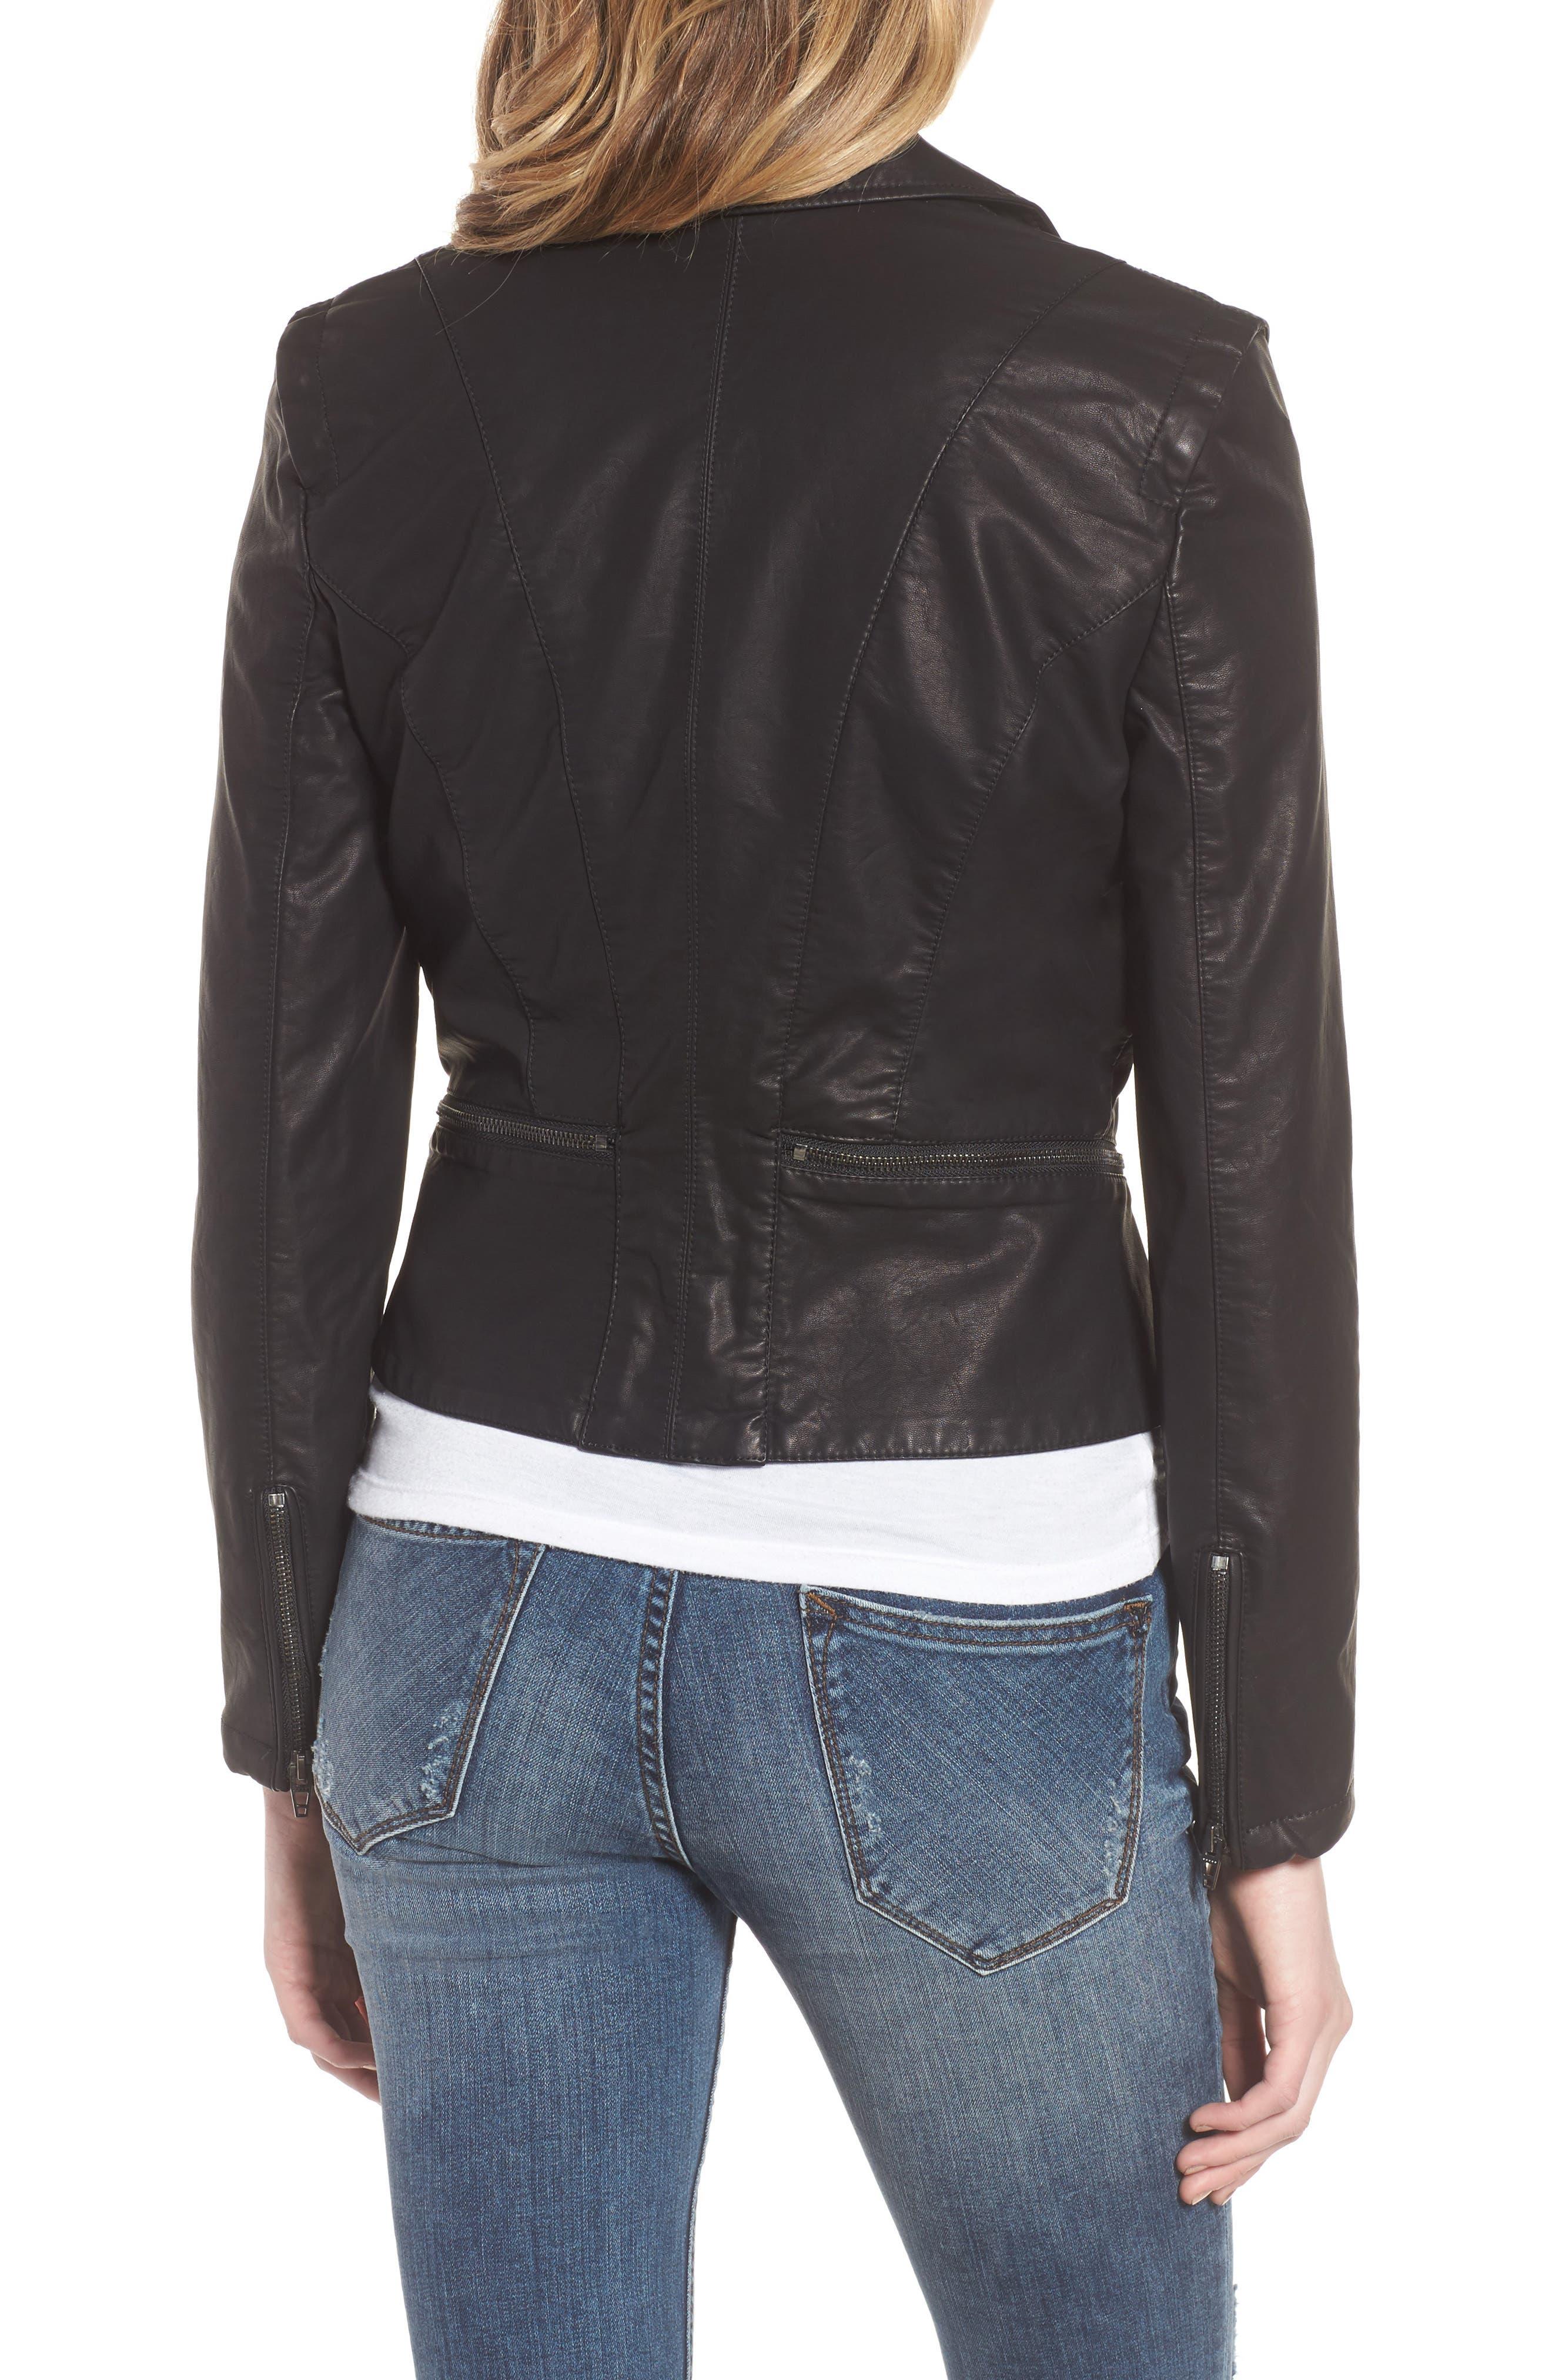 BLANKNYC, Faux Leather Moto Jacket, Alternate thumbnail 4, color, BLACK